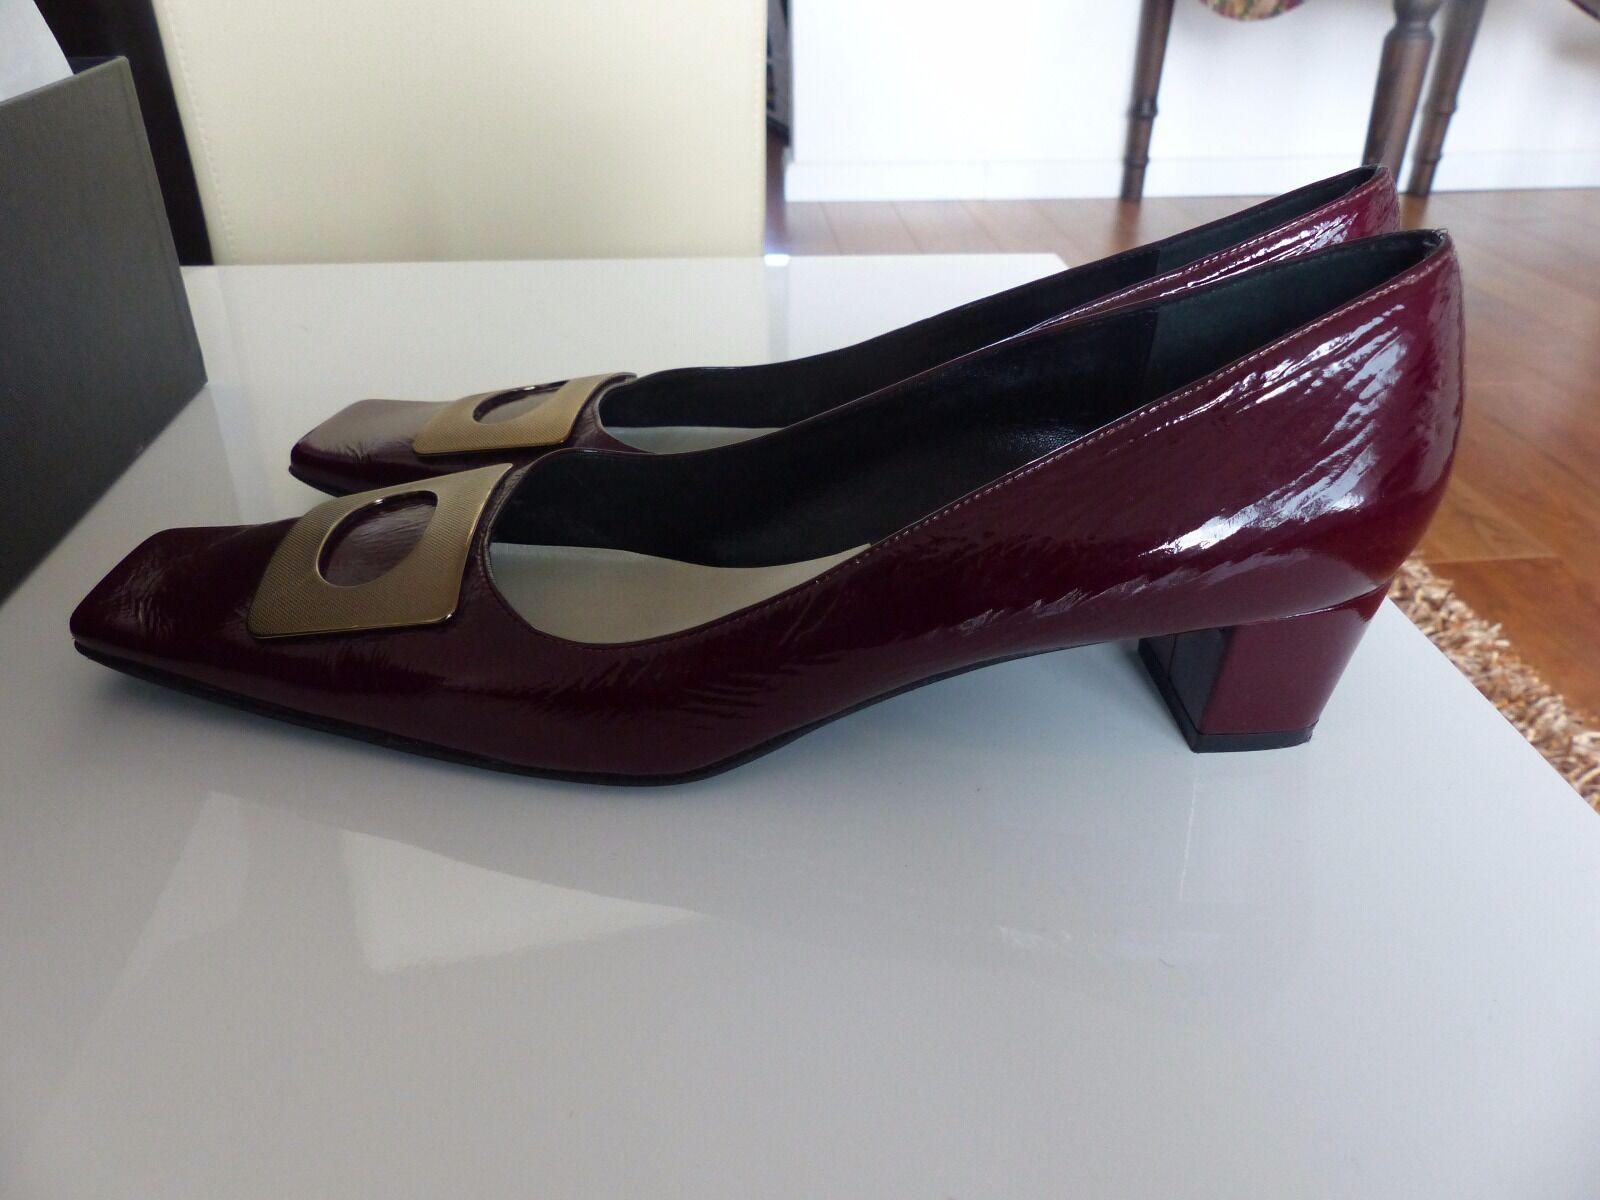 Designer Damen Schuhe Nebuloni Flavio Zanasca Größe 40